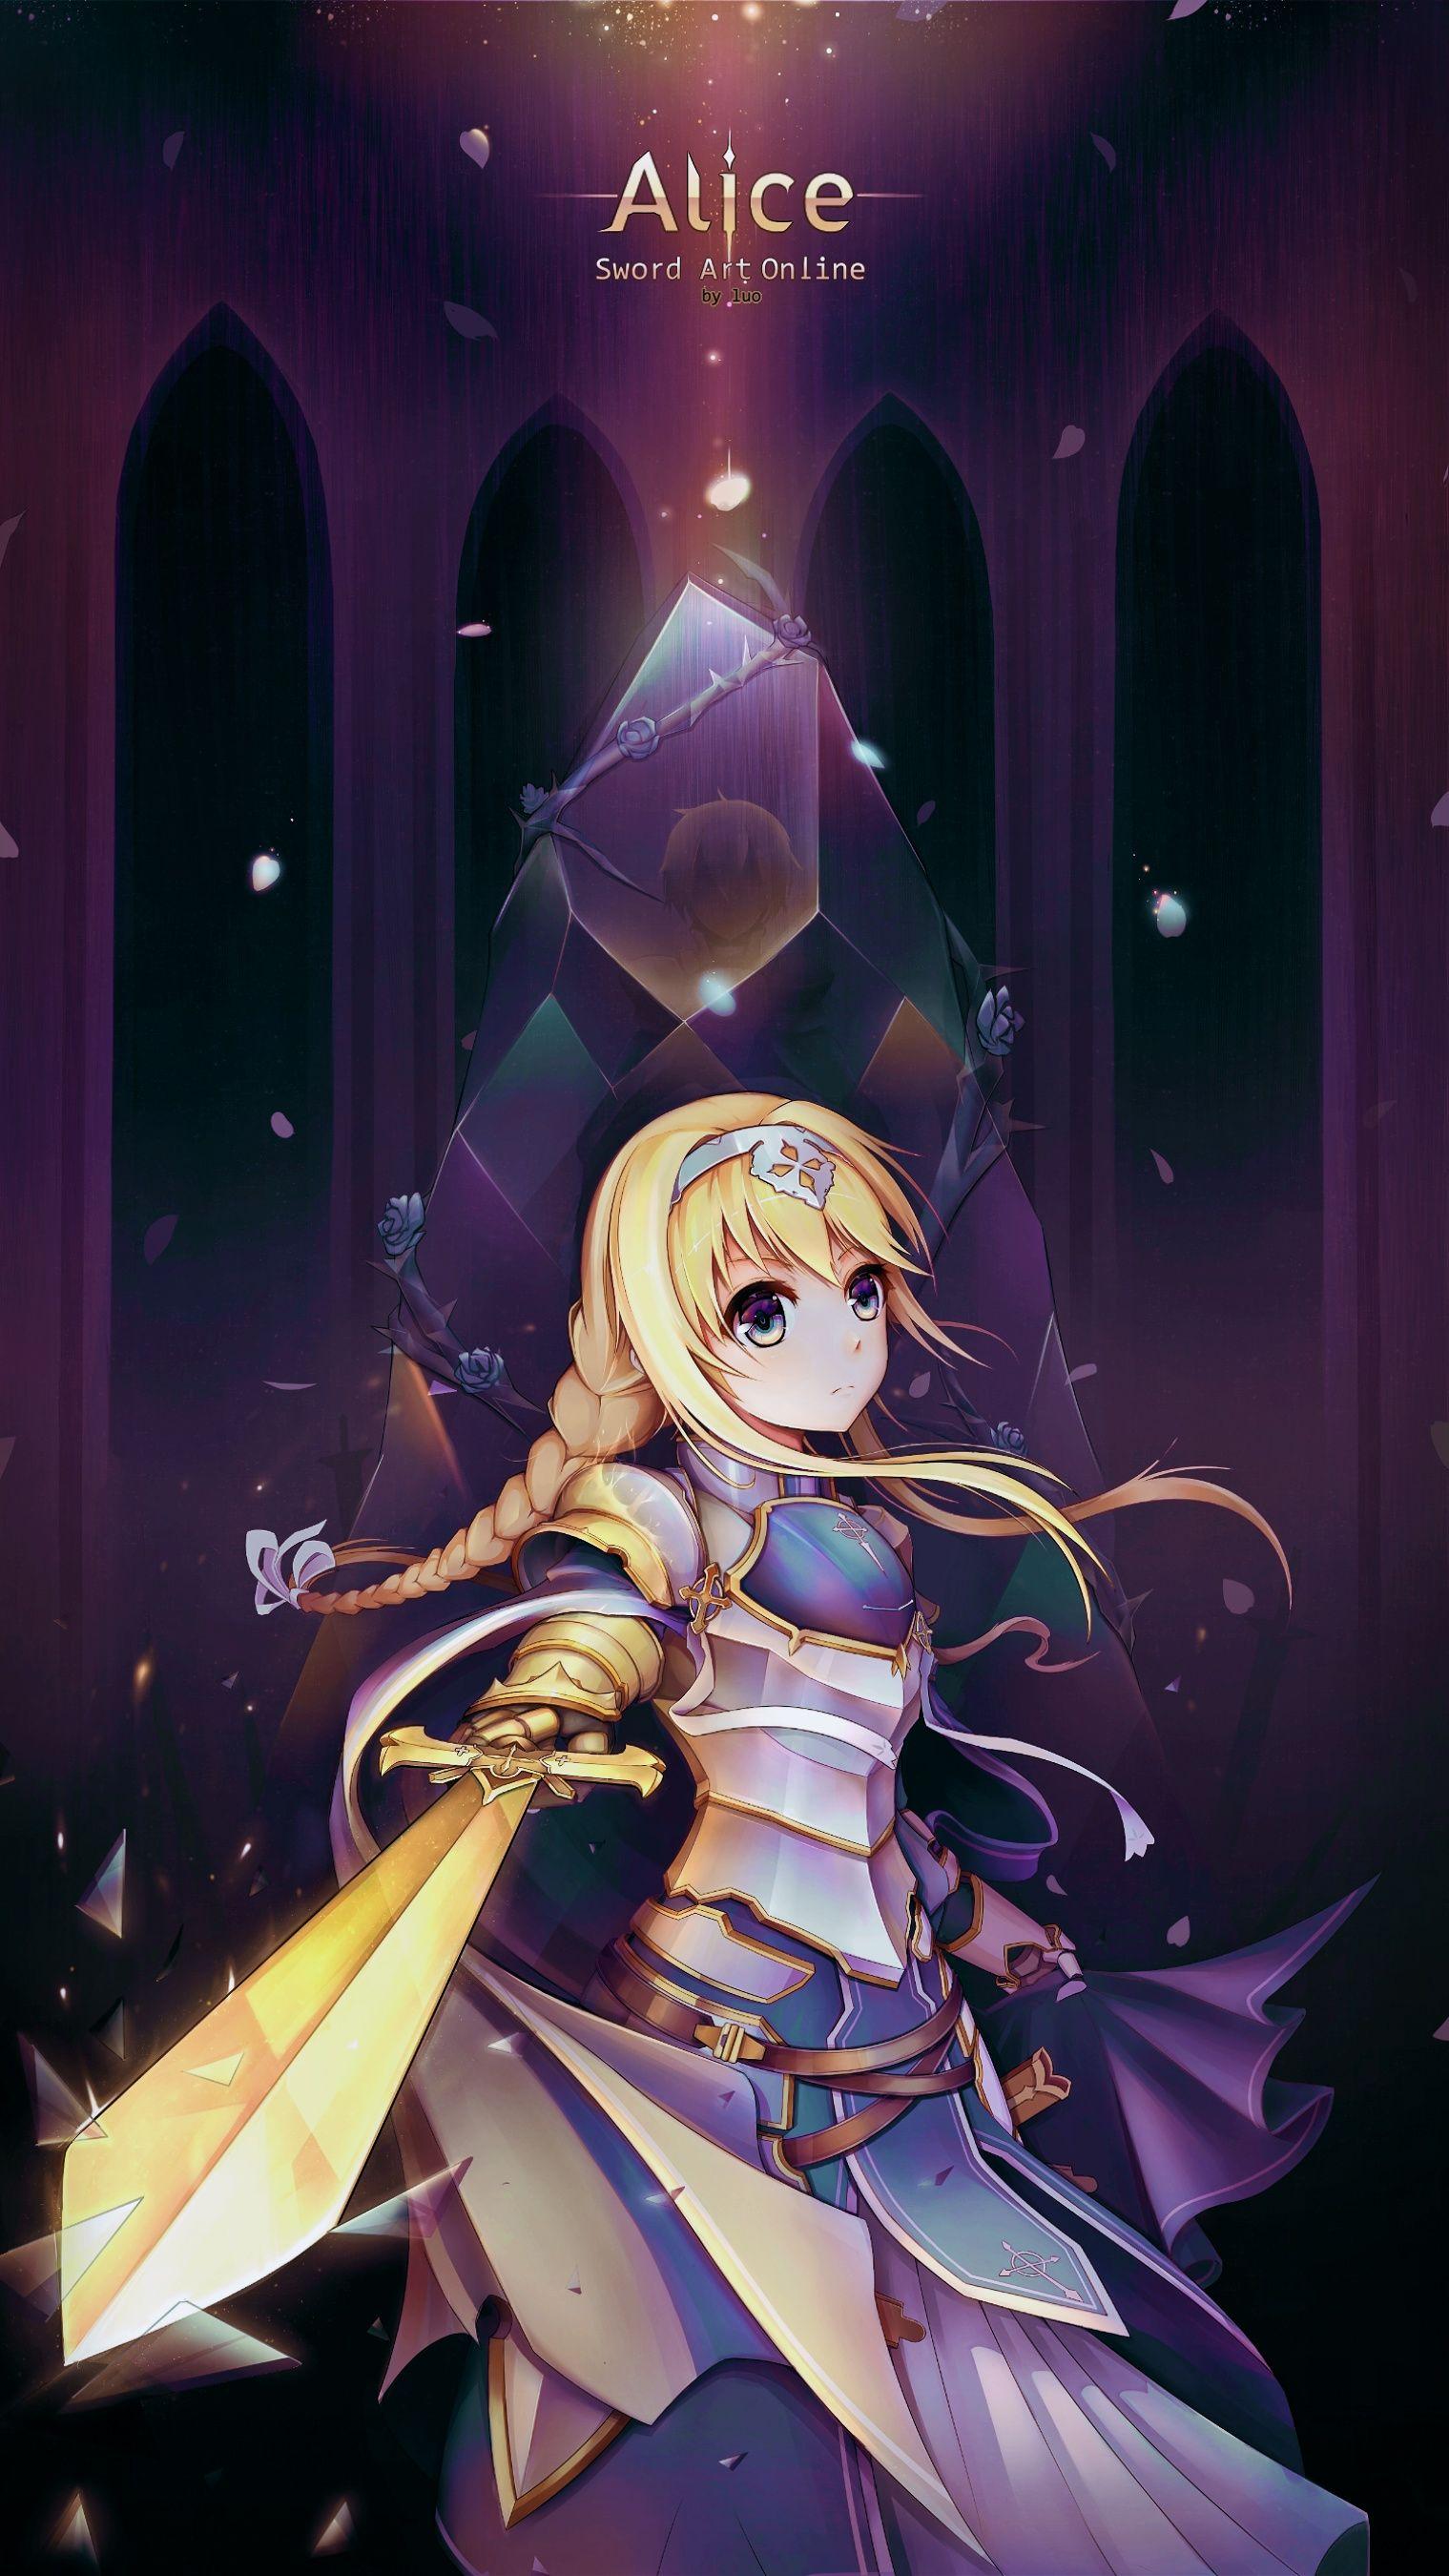 Alice Zuberg Sao Fanart Manga Anime Animegirl Gg Sword Art Sword Art Online Online Art